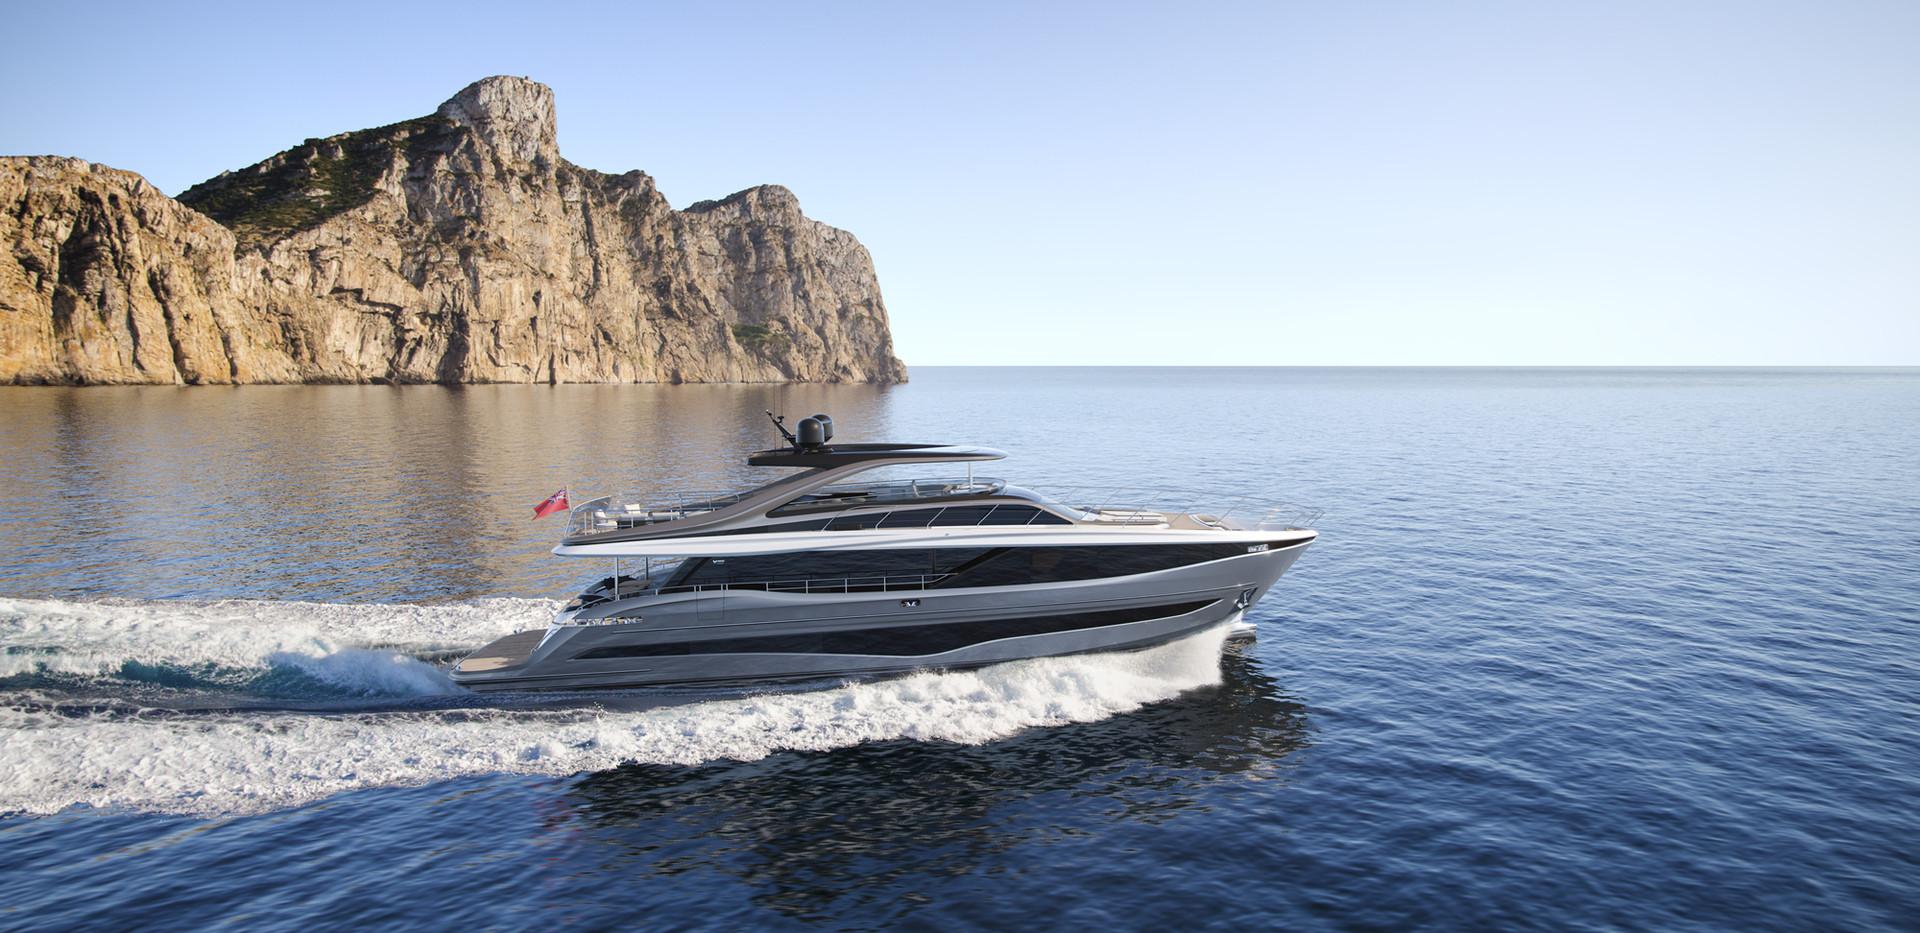 y95-exterior-grey-hull.jpg